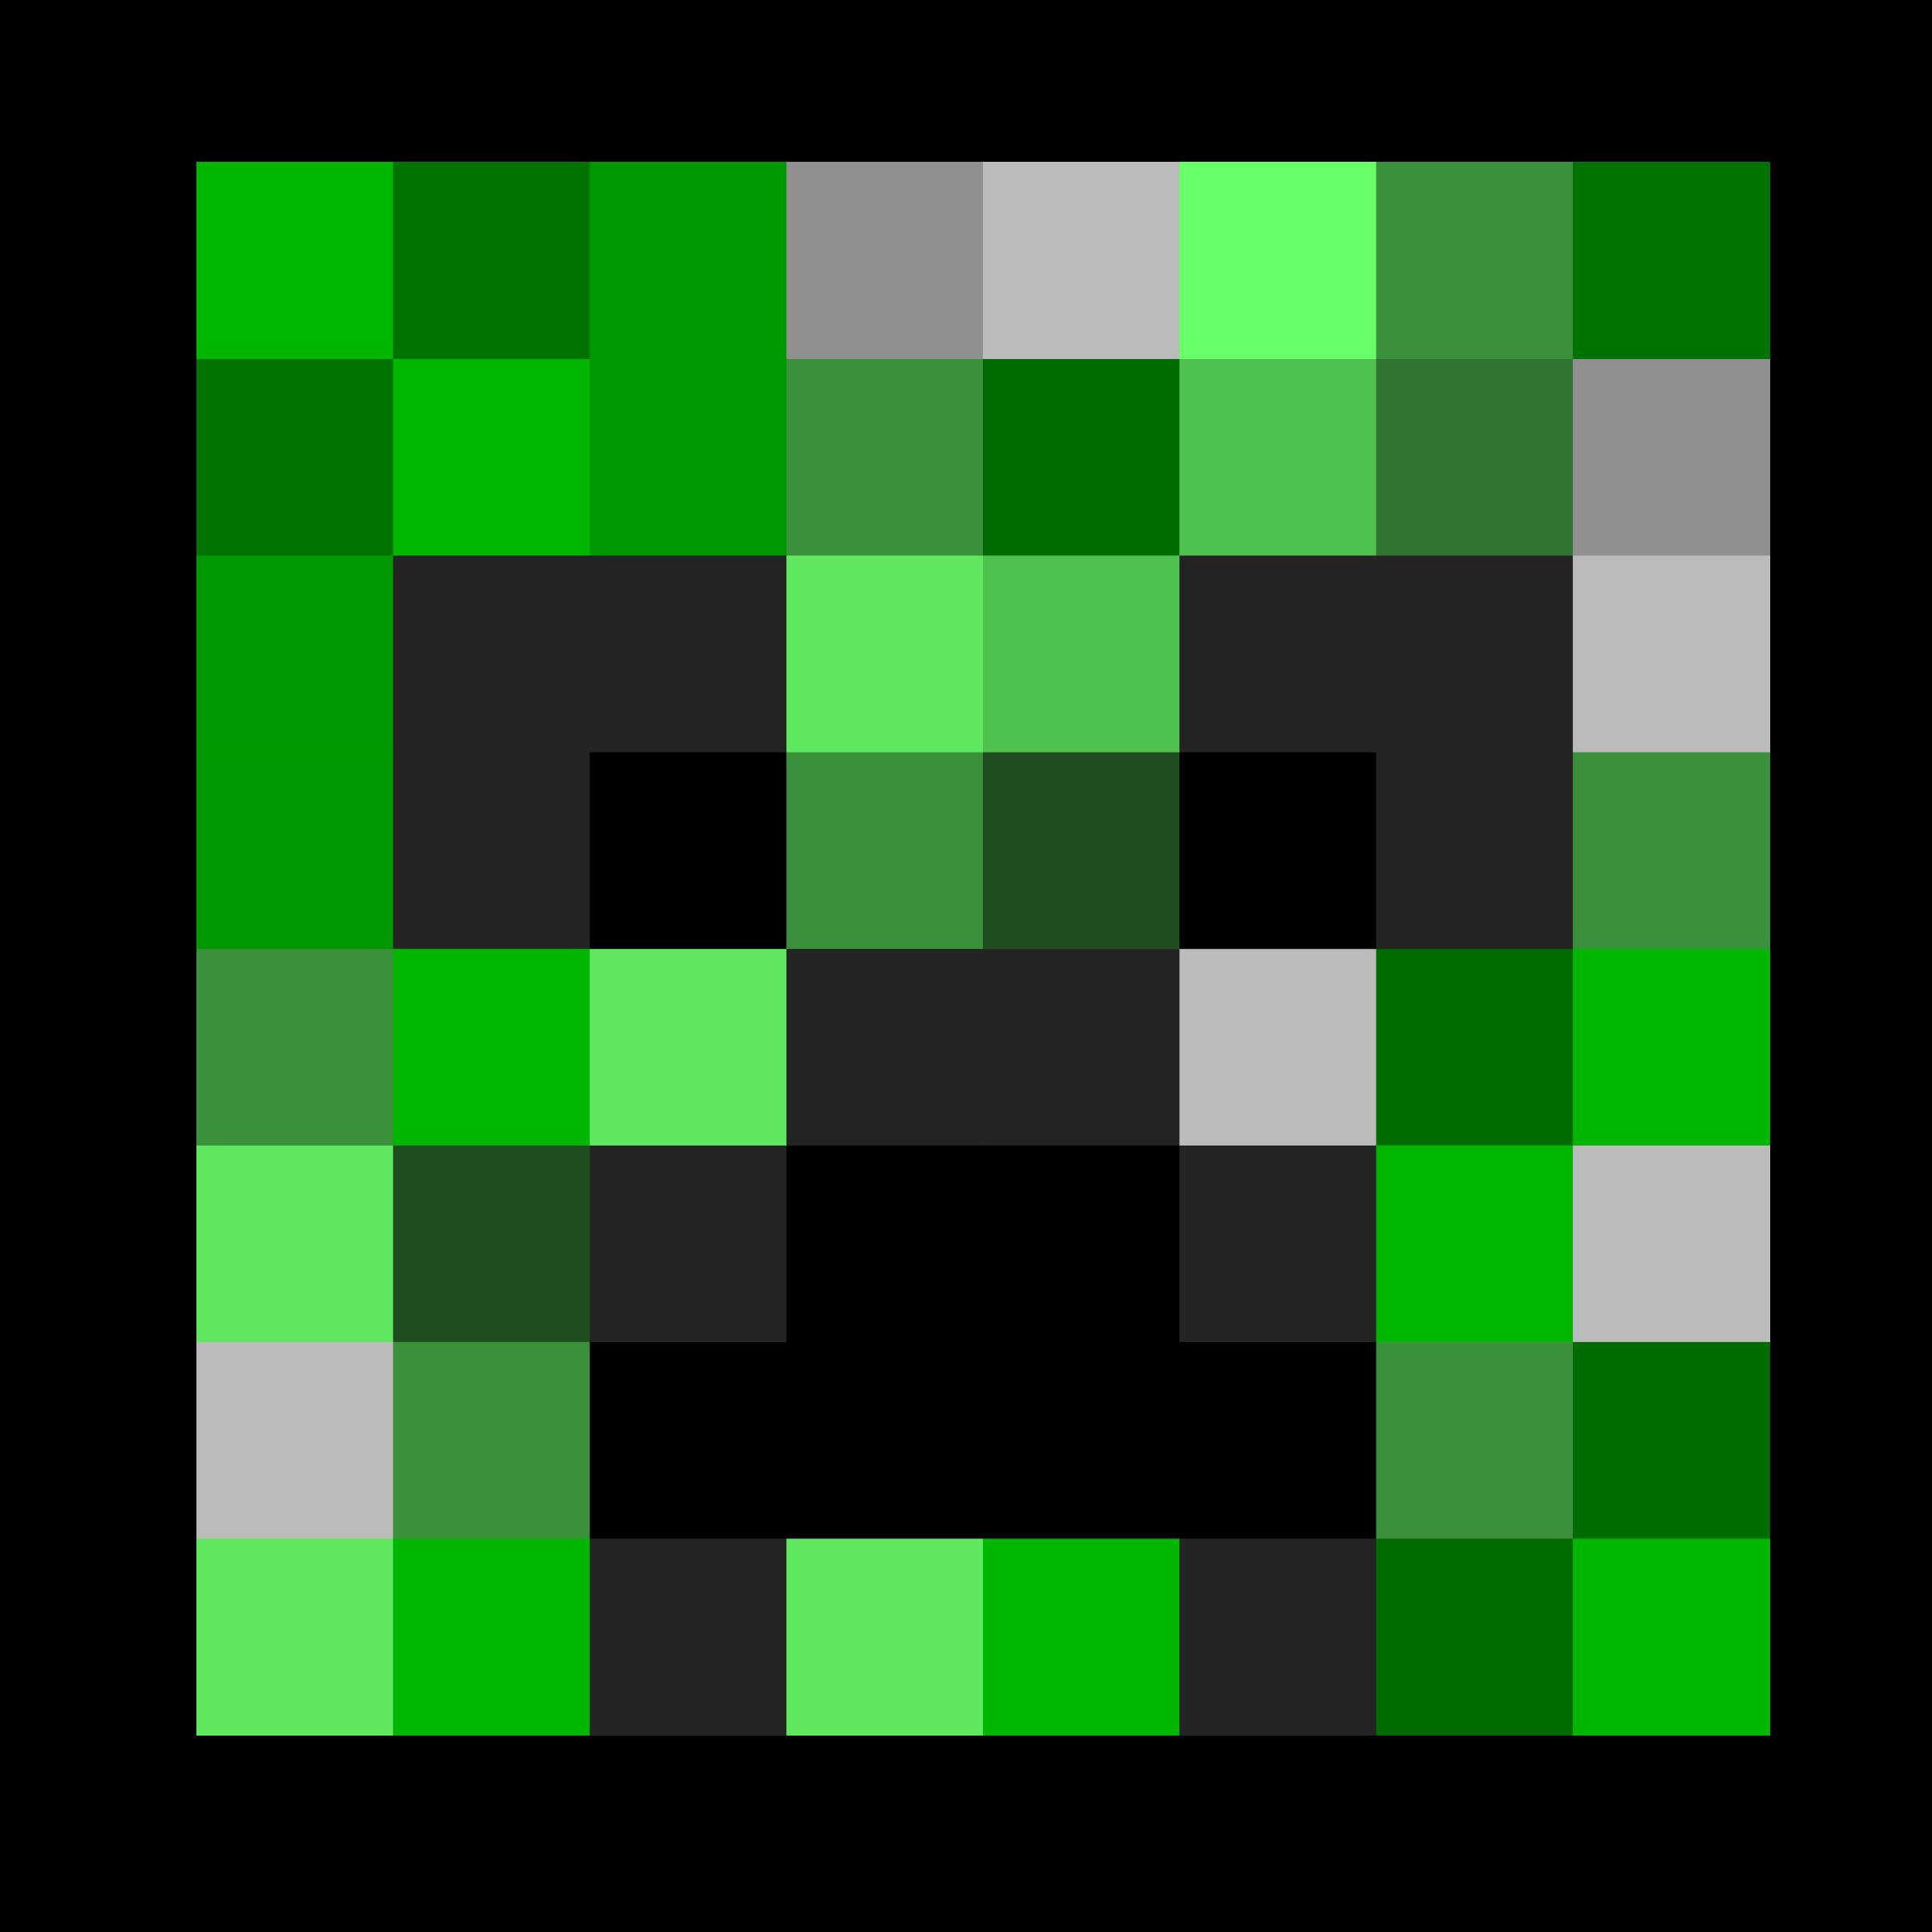 Creeper face big image. Cucumber clipart minecraft